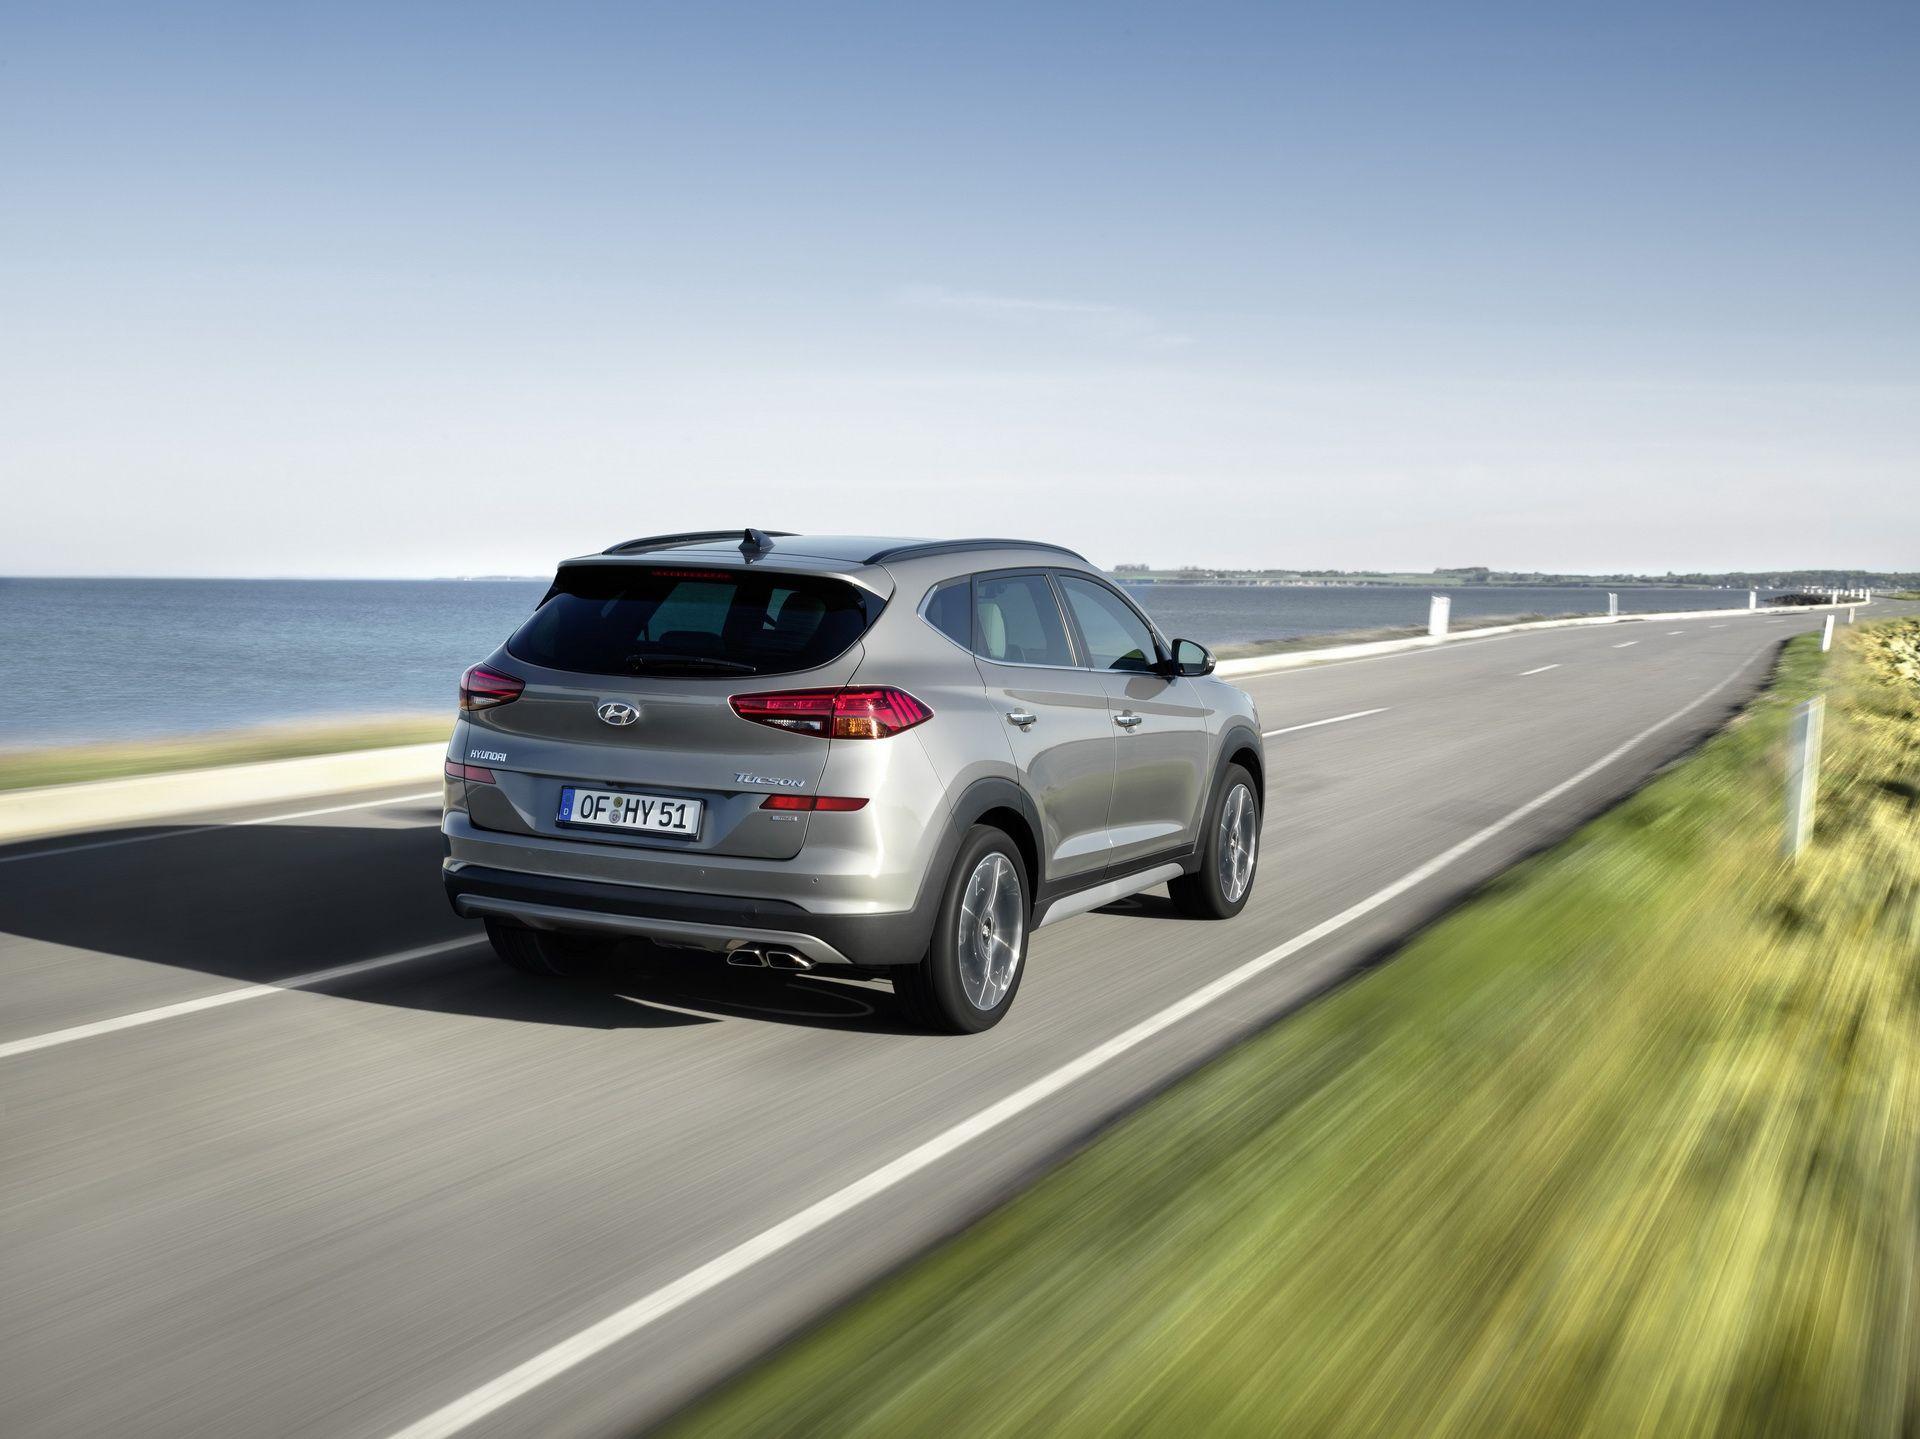 Hyundai Tucson Goes to SEMA the Off-Road Way - autoevolution